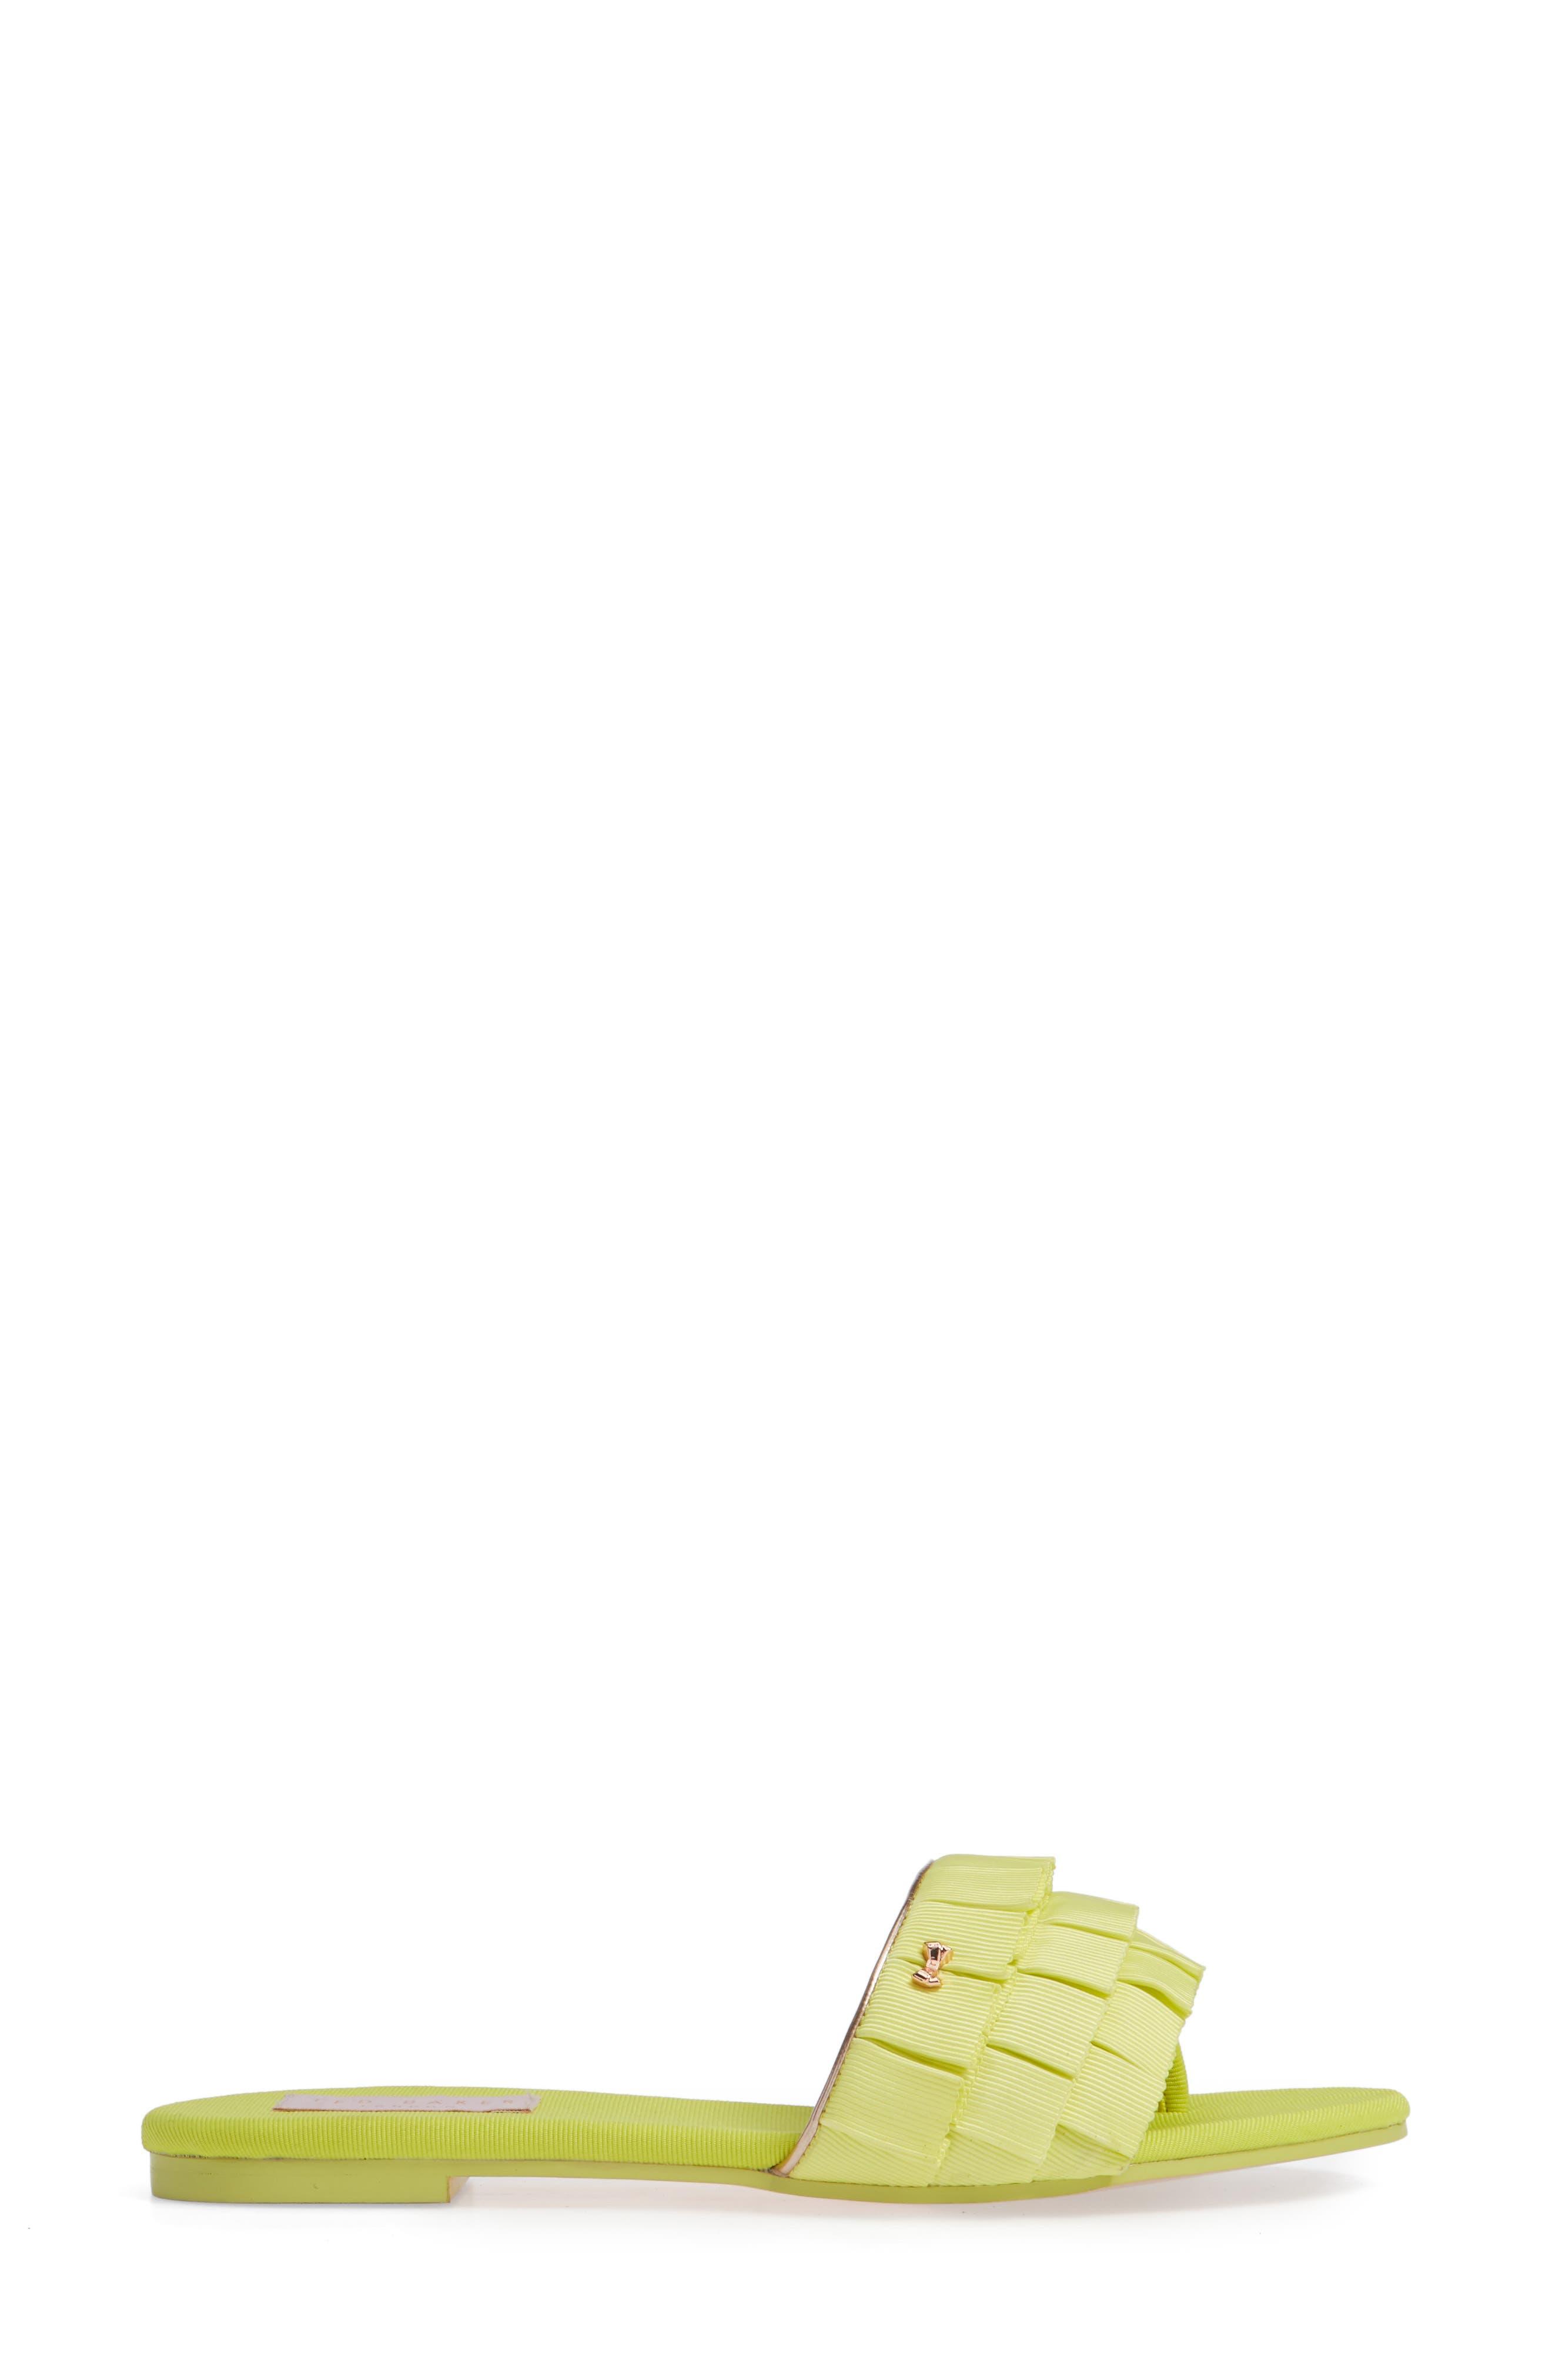 Towdi Sandal,                             Alternate thumbnail 6, color,                             Yellow Fabric